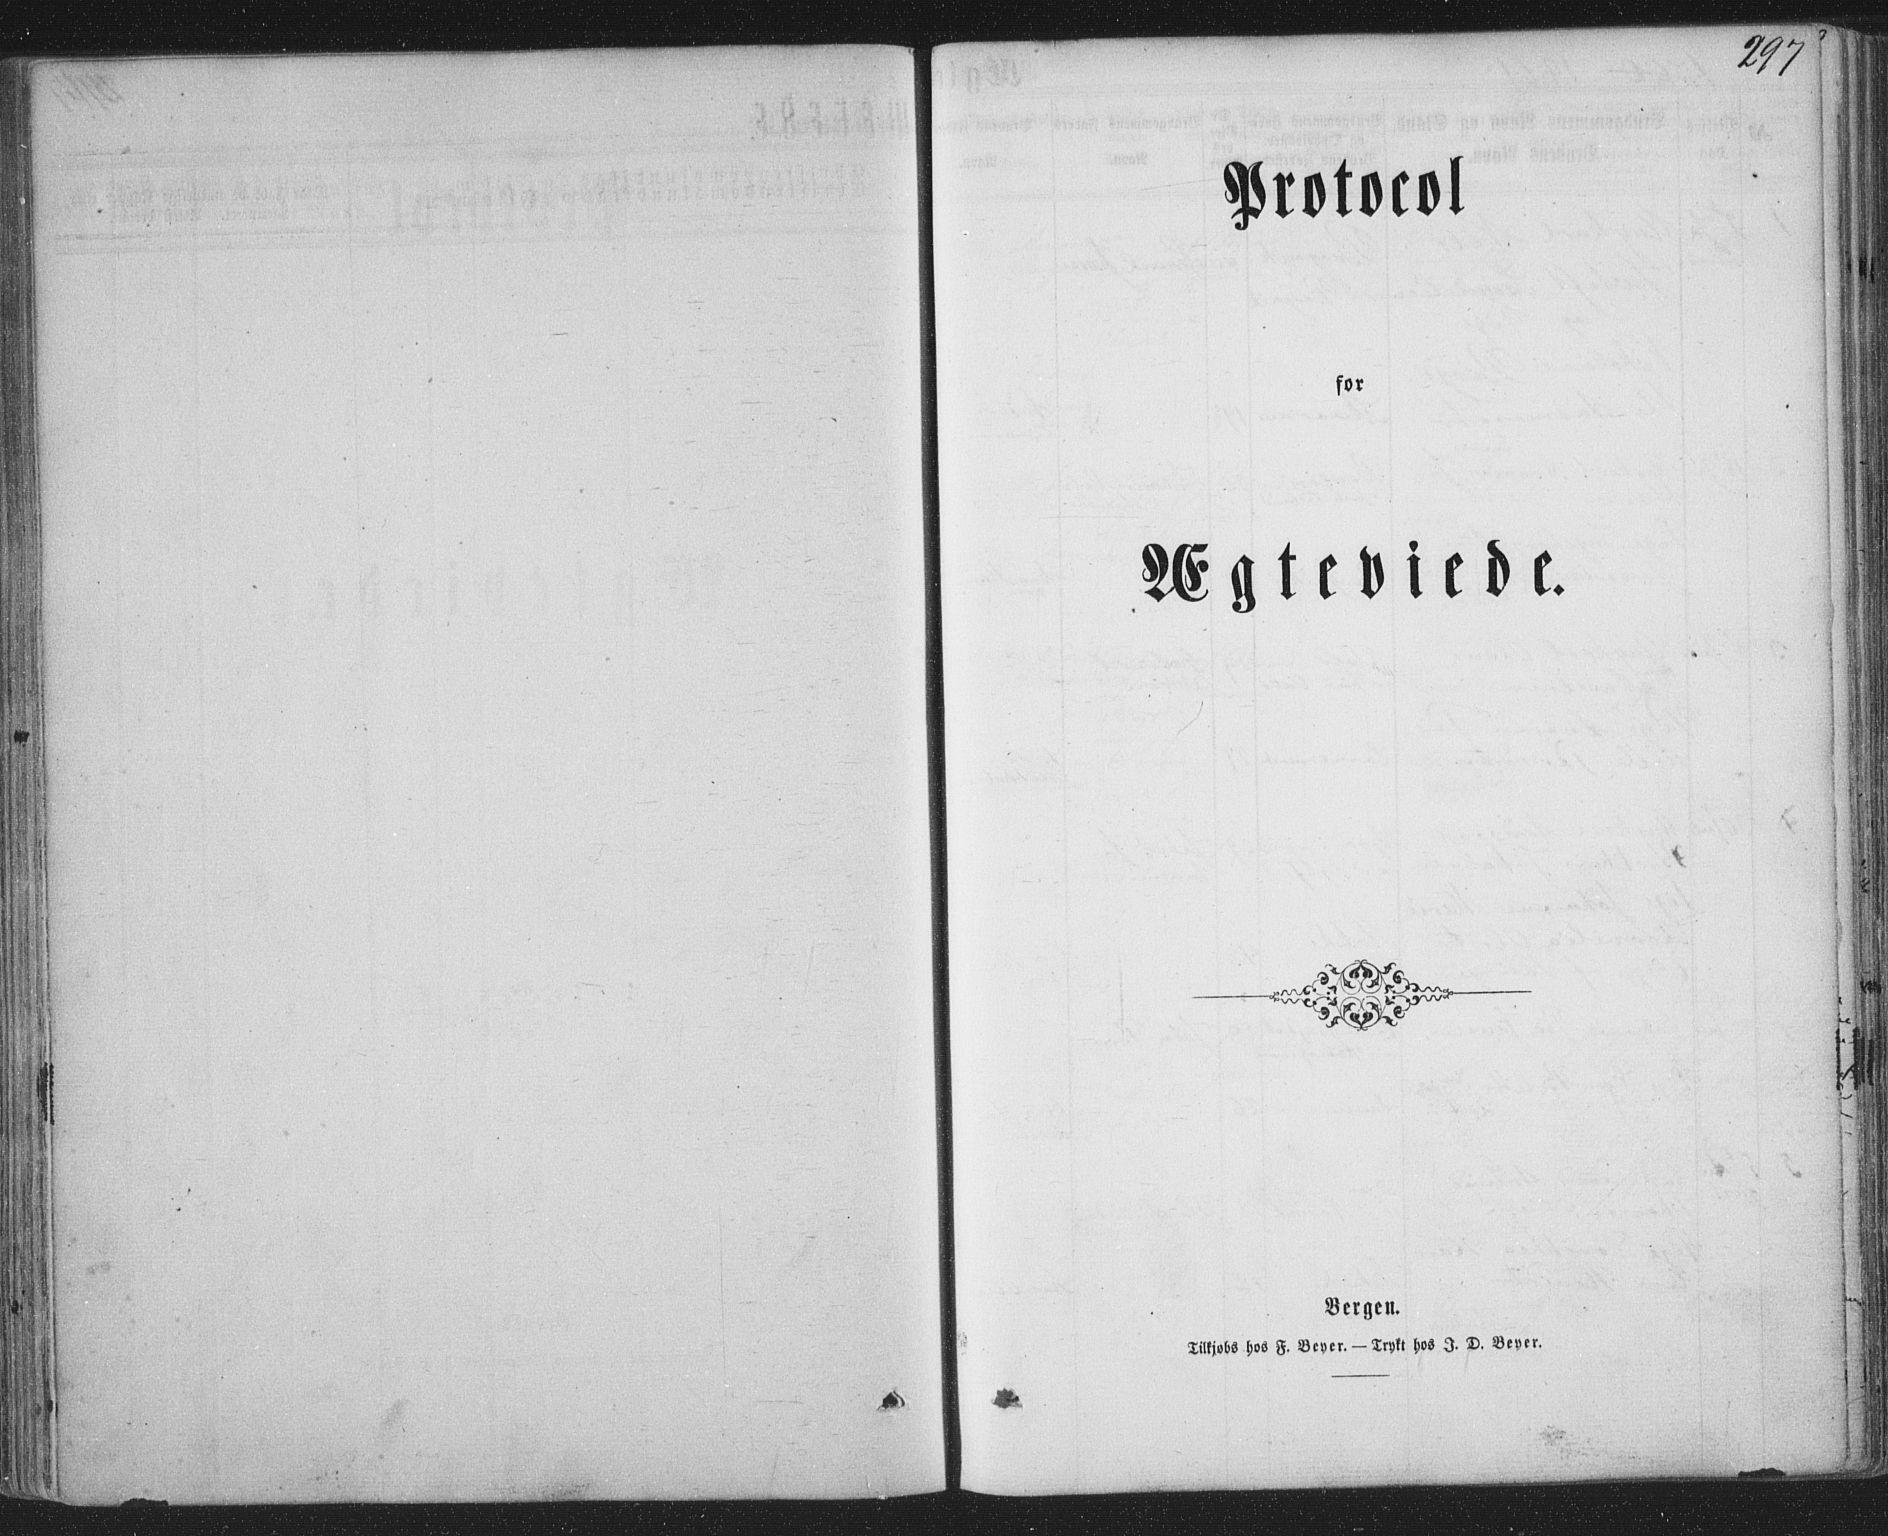 SAT, Ministerialprotokoller, klokkerbøker og fødselsregistre - Nordland, 863/L0896: Ministerialbok nr. 863A08, 1861-1871, s. 297